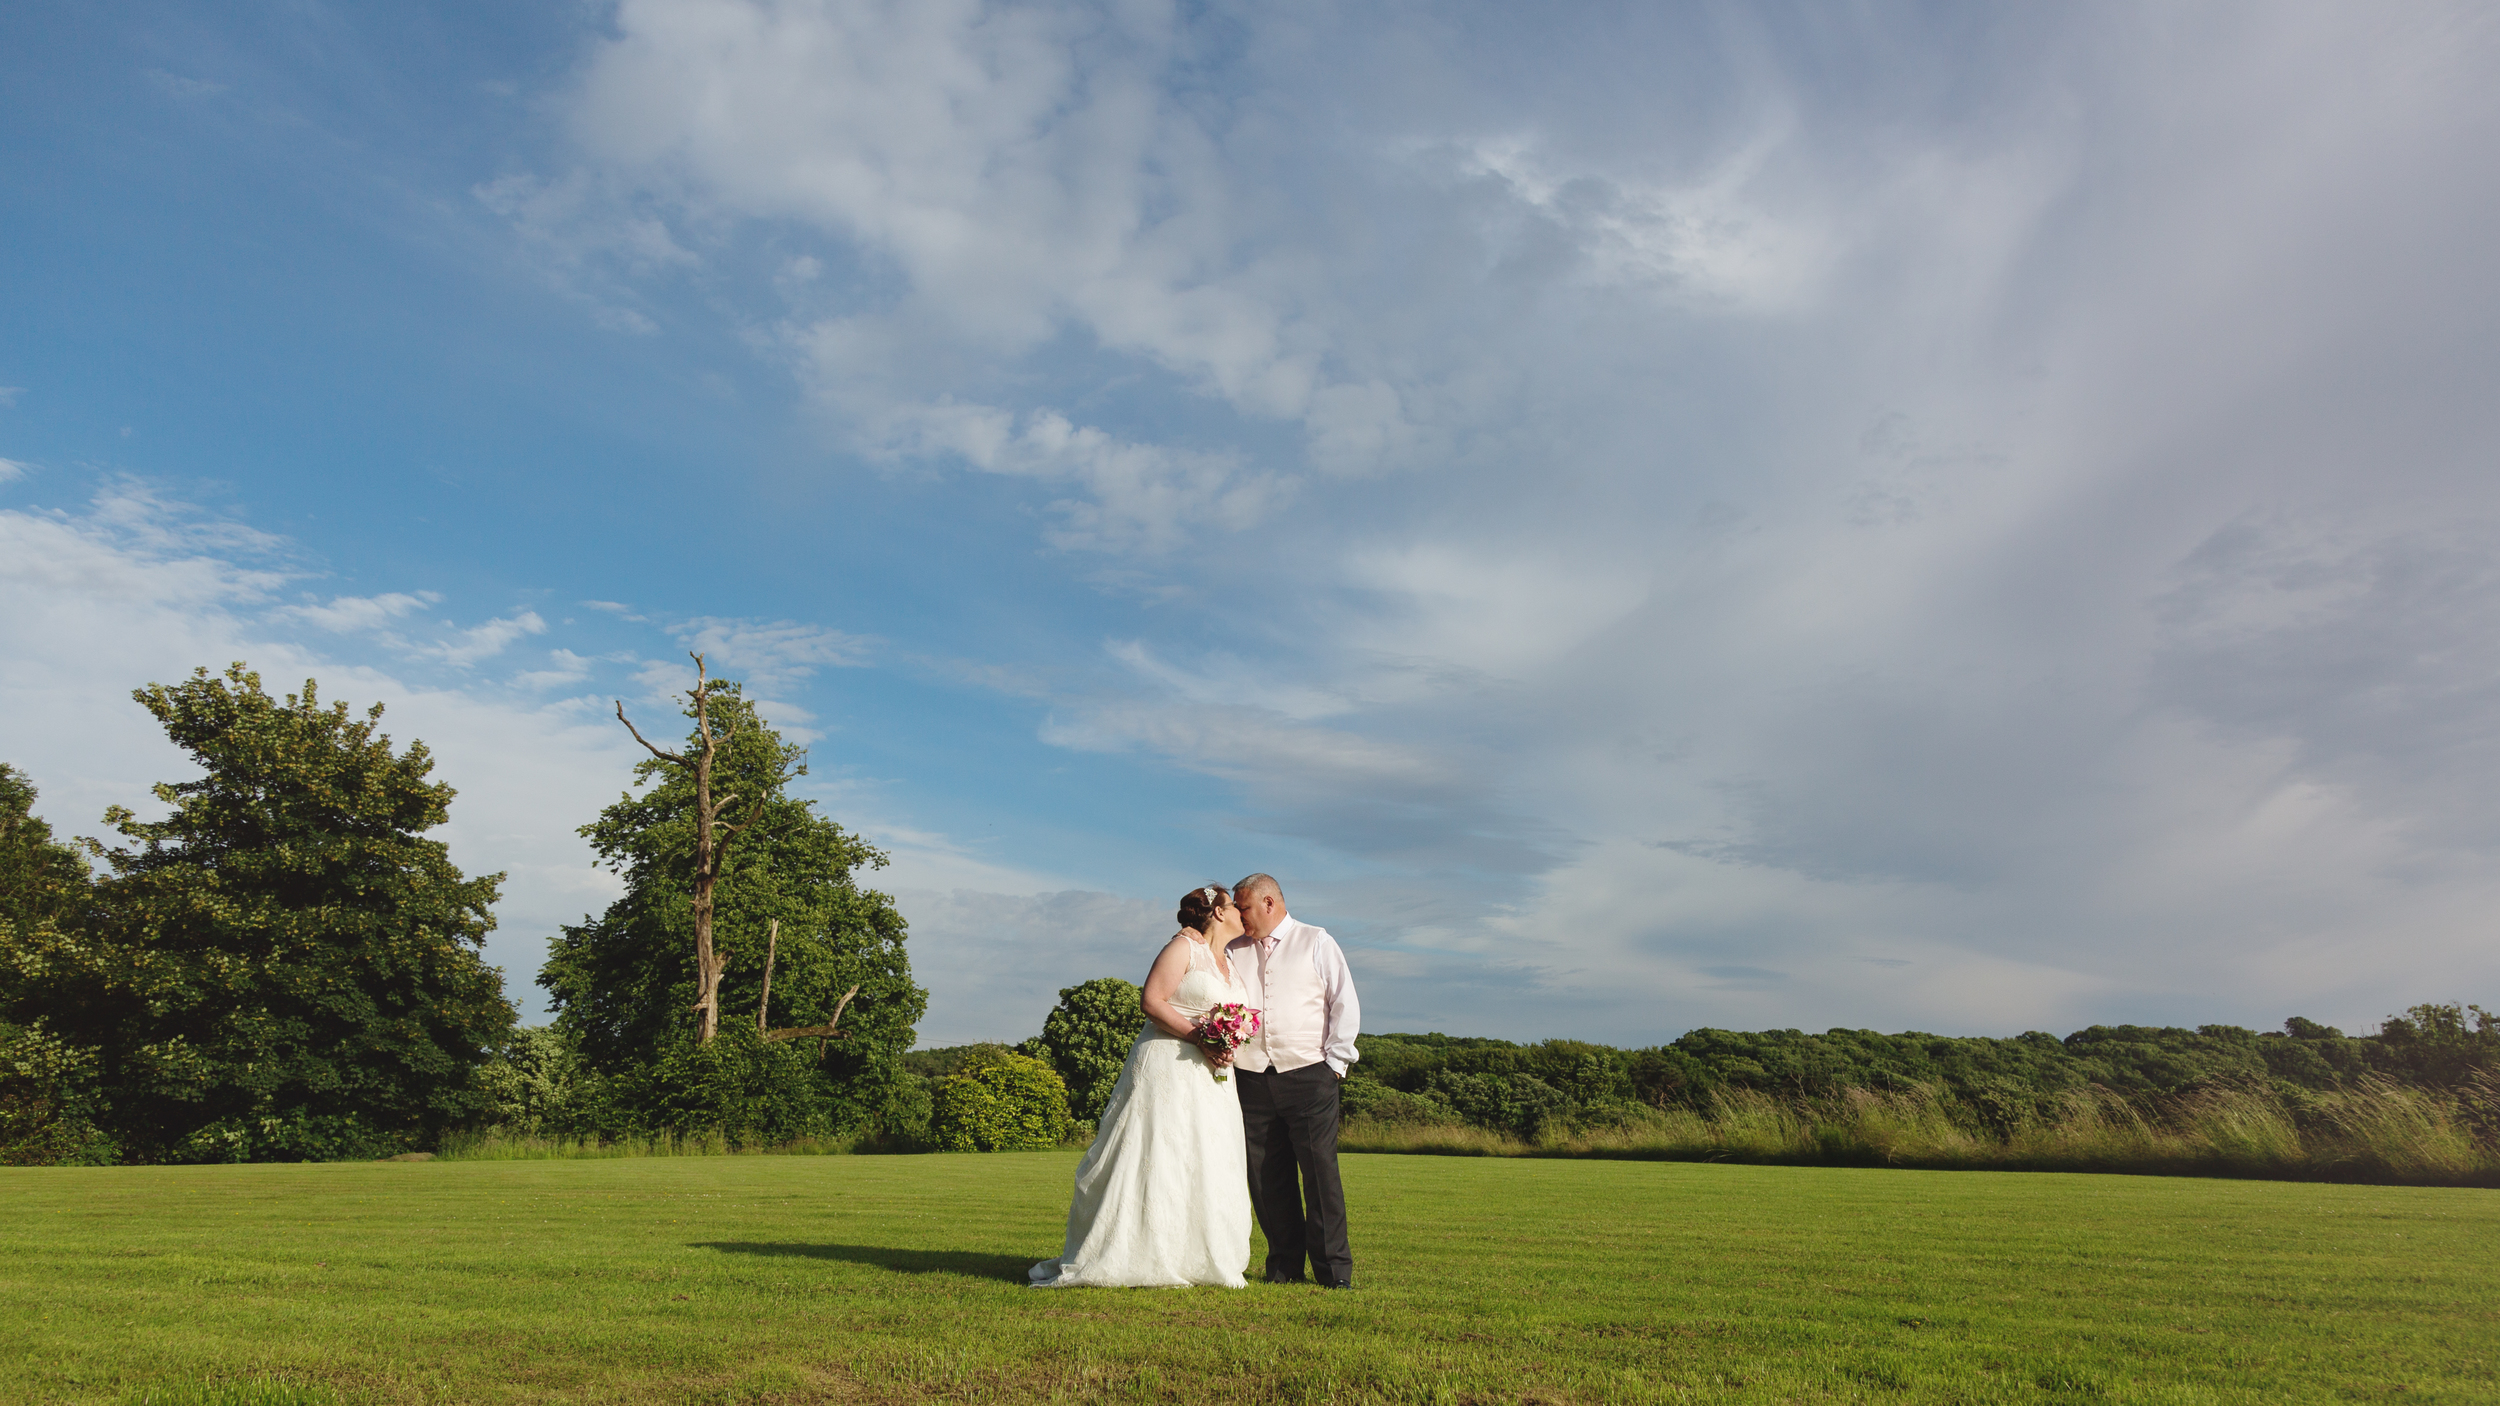 Court Cole man wedding photographer, wedding photographer Bridgend, Caerphilly, Cardiff